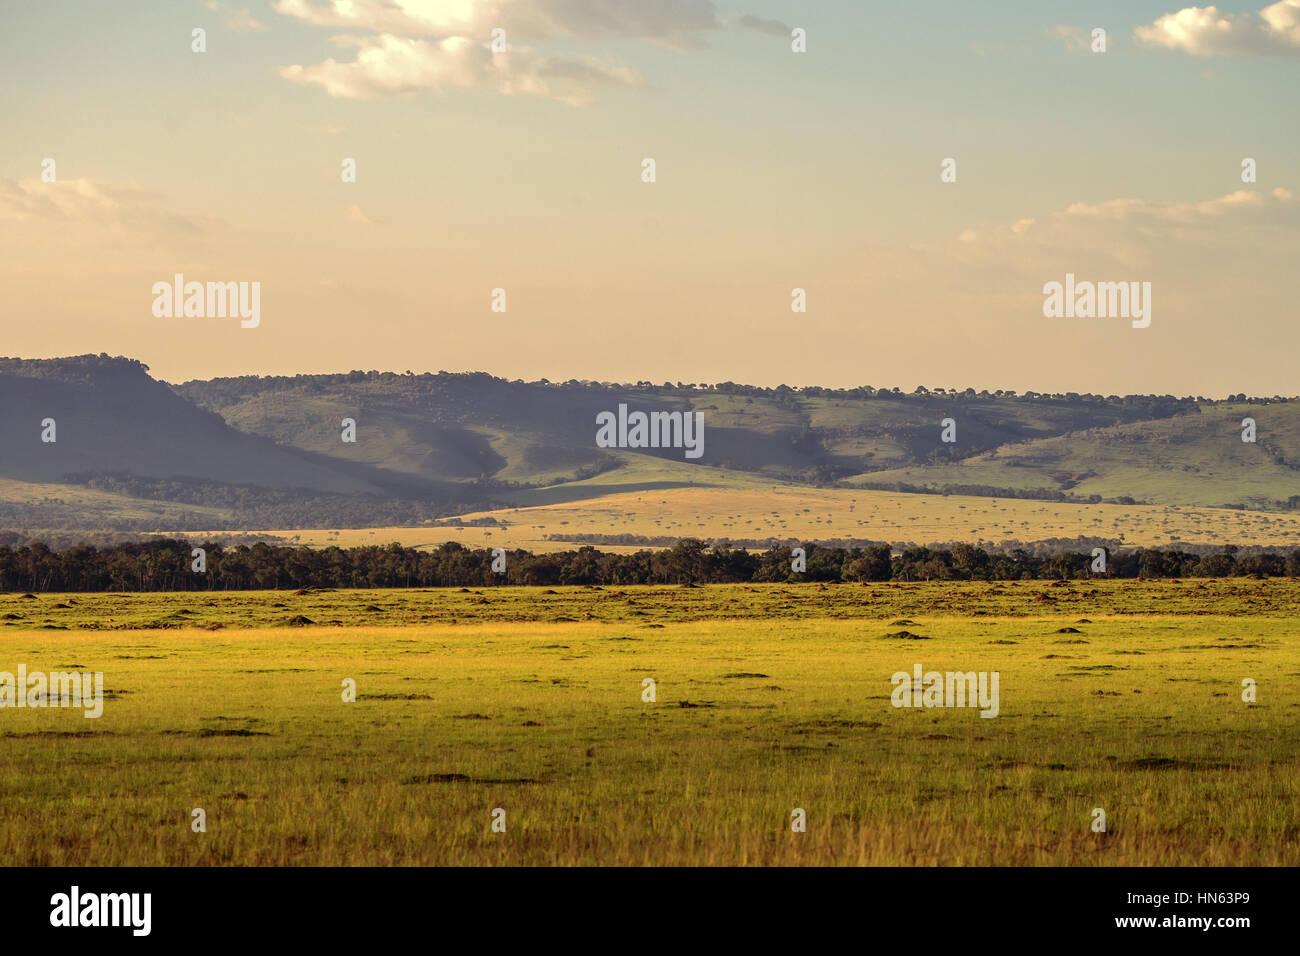 Paysage de savane africaine pittoresque en Maasai Mara, Kenya Photo Stock